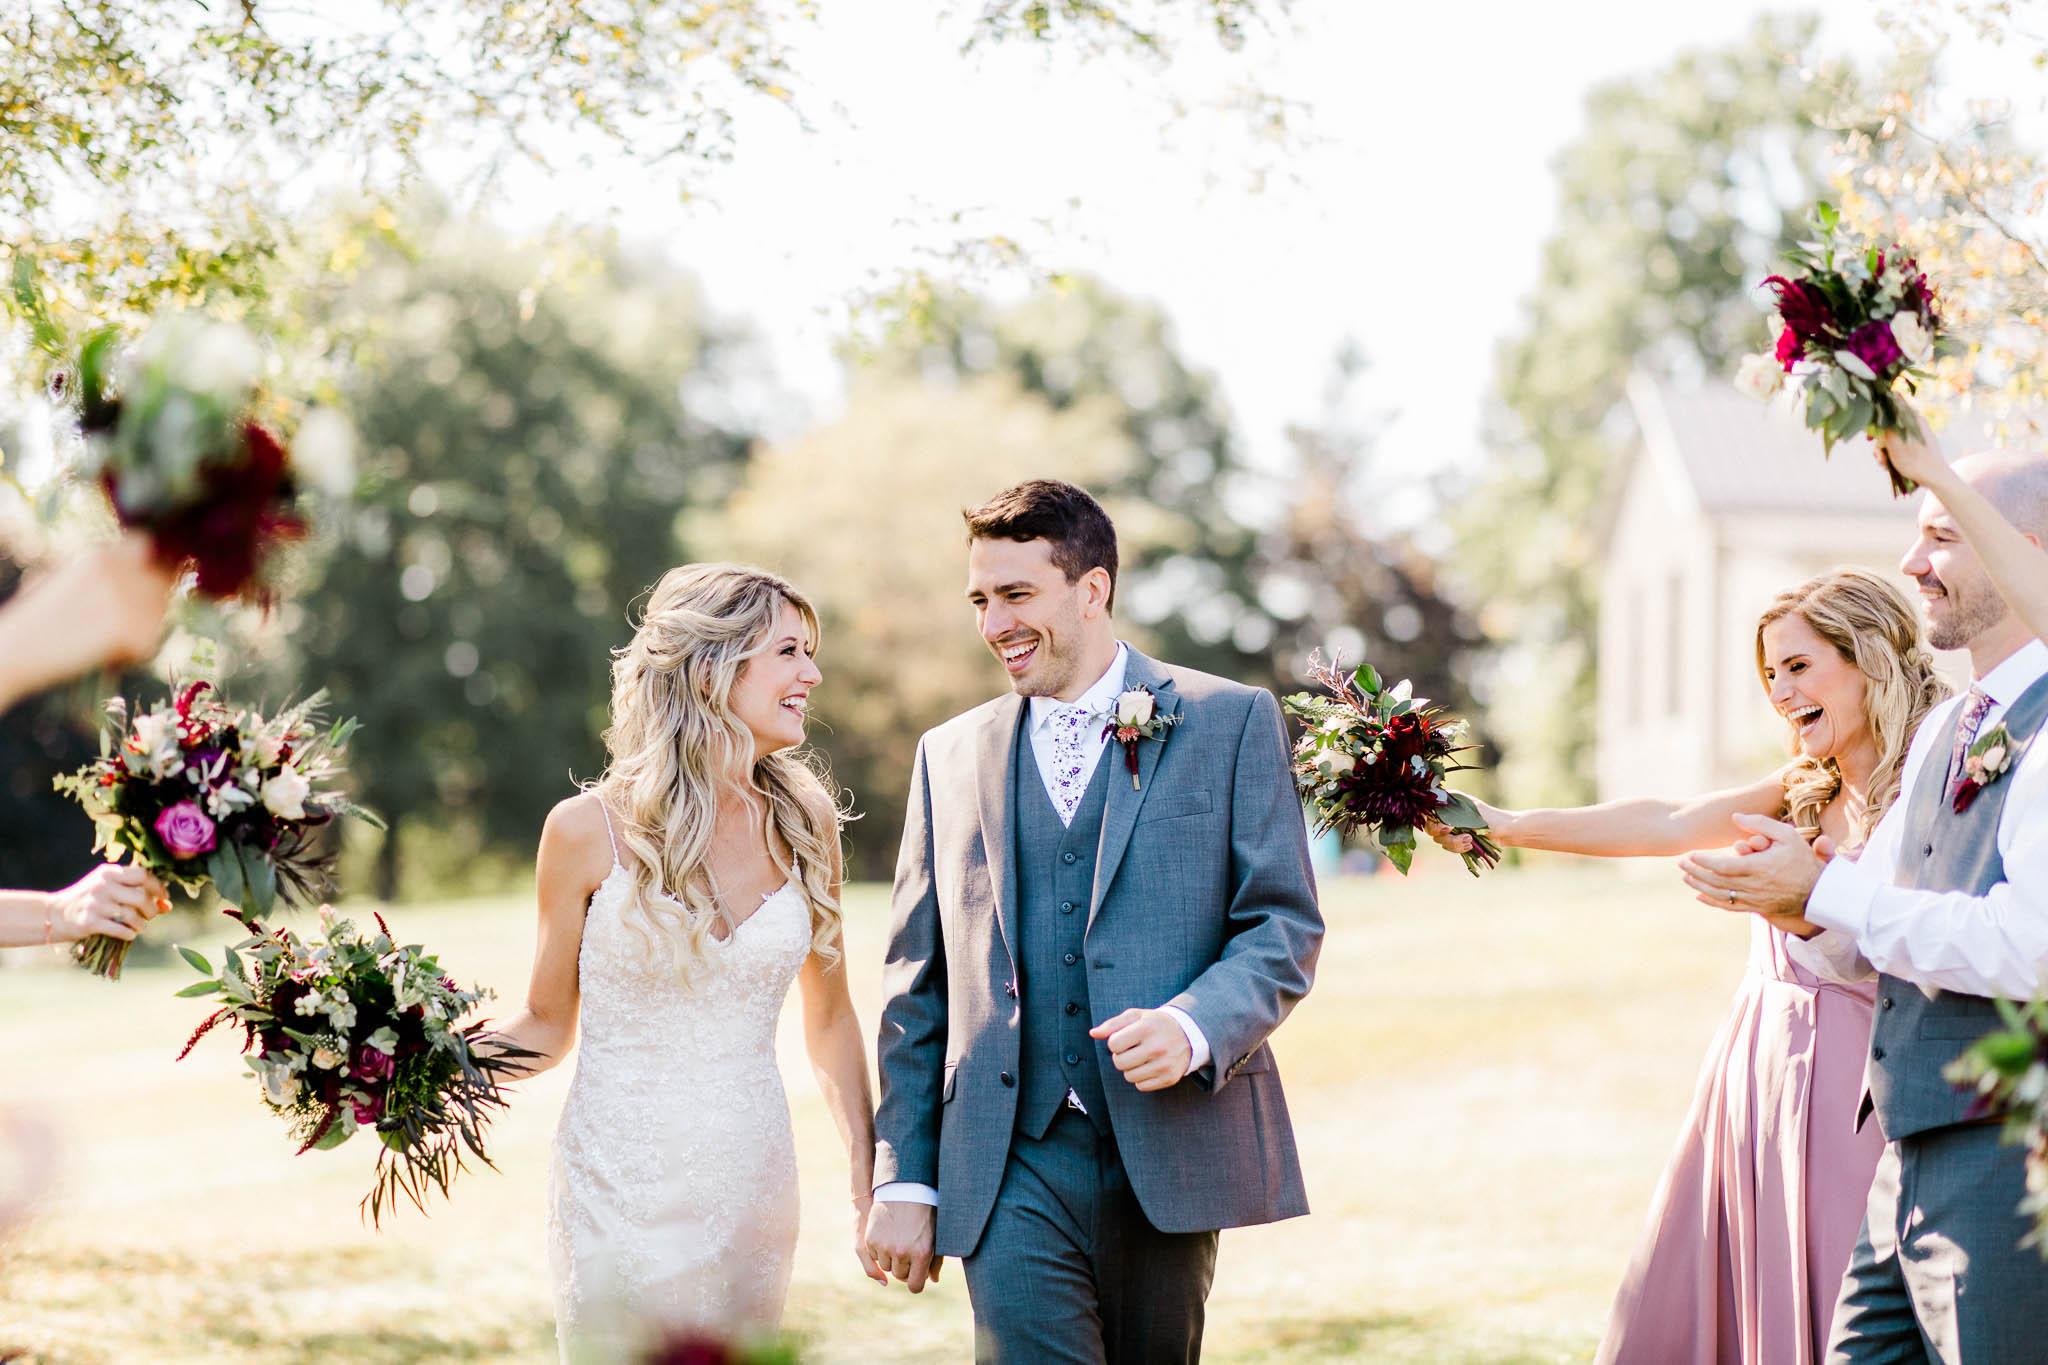 Frosty-Valley-September-Wedding-7295.jpg